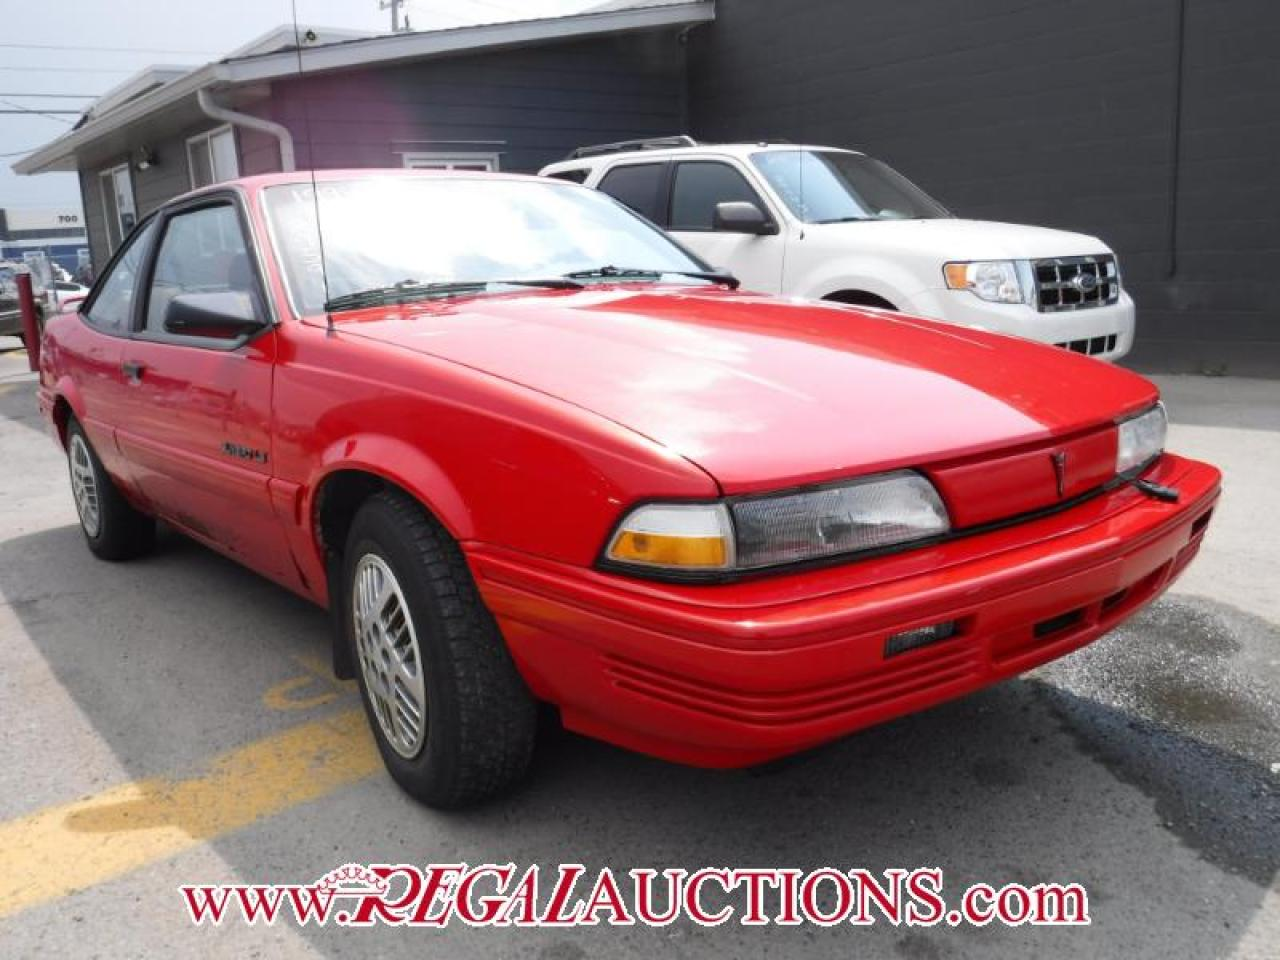 Photo of Red 1994 Pontiac Sunbird